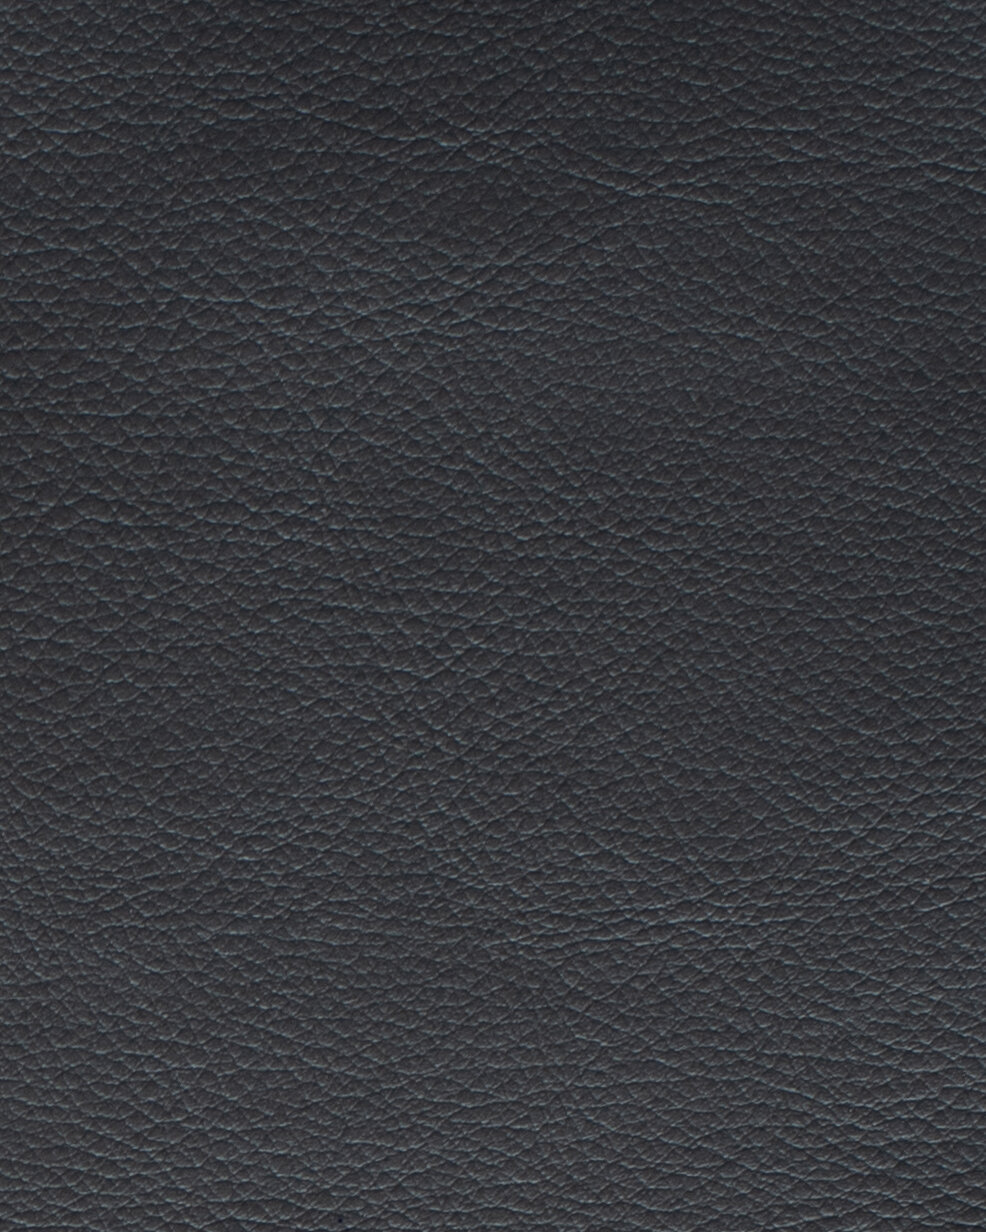 Faux Leather: Graphite